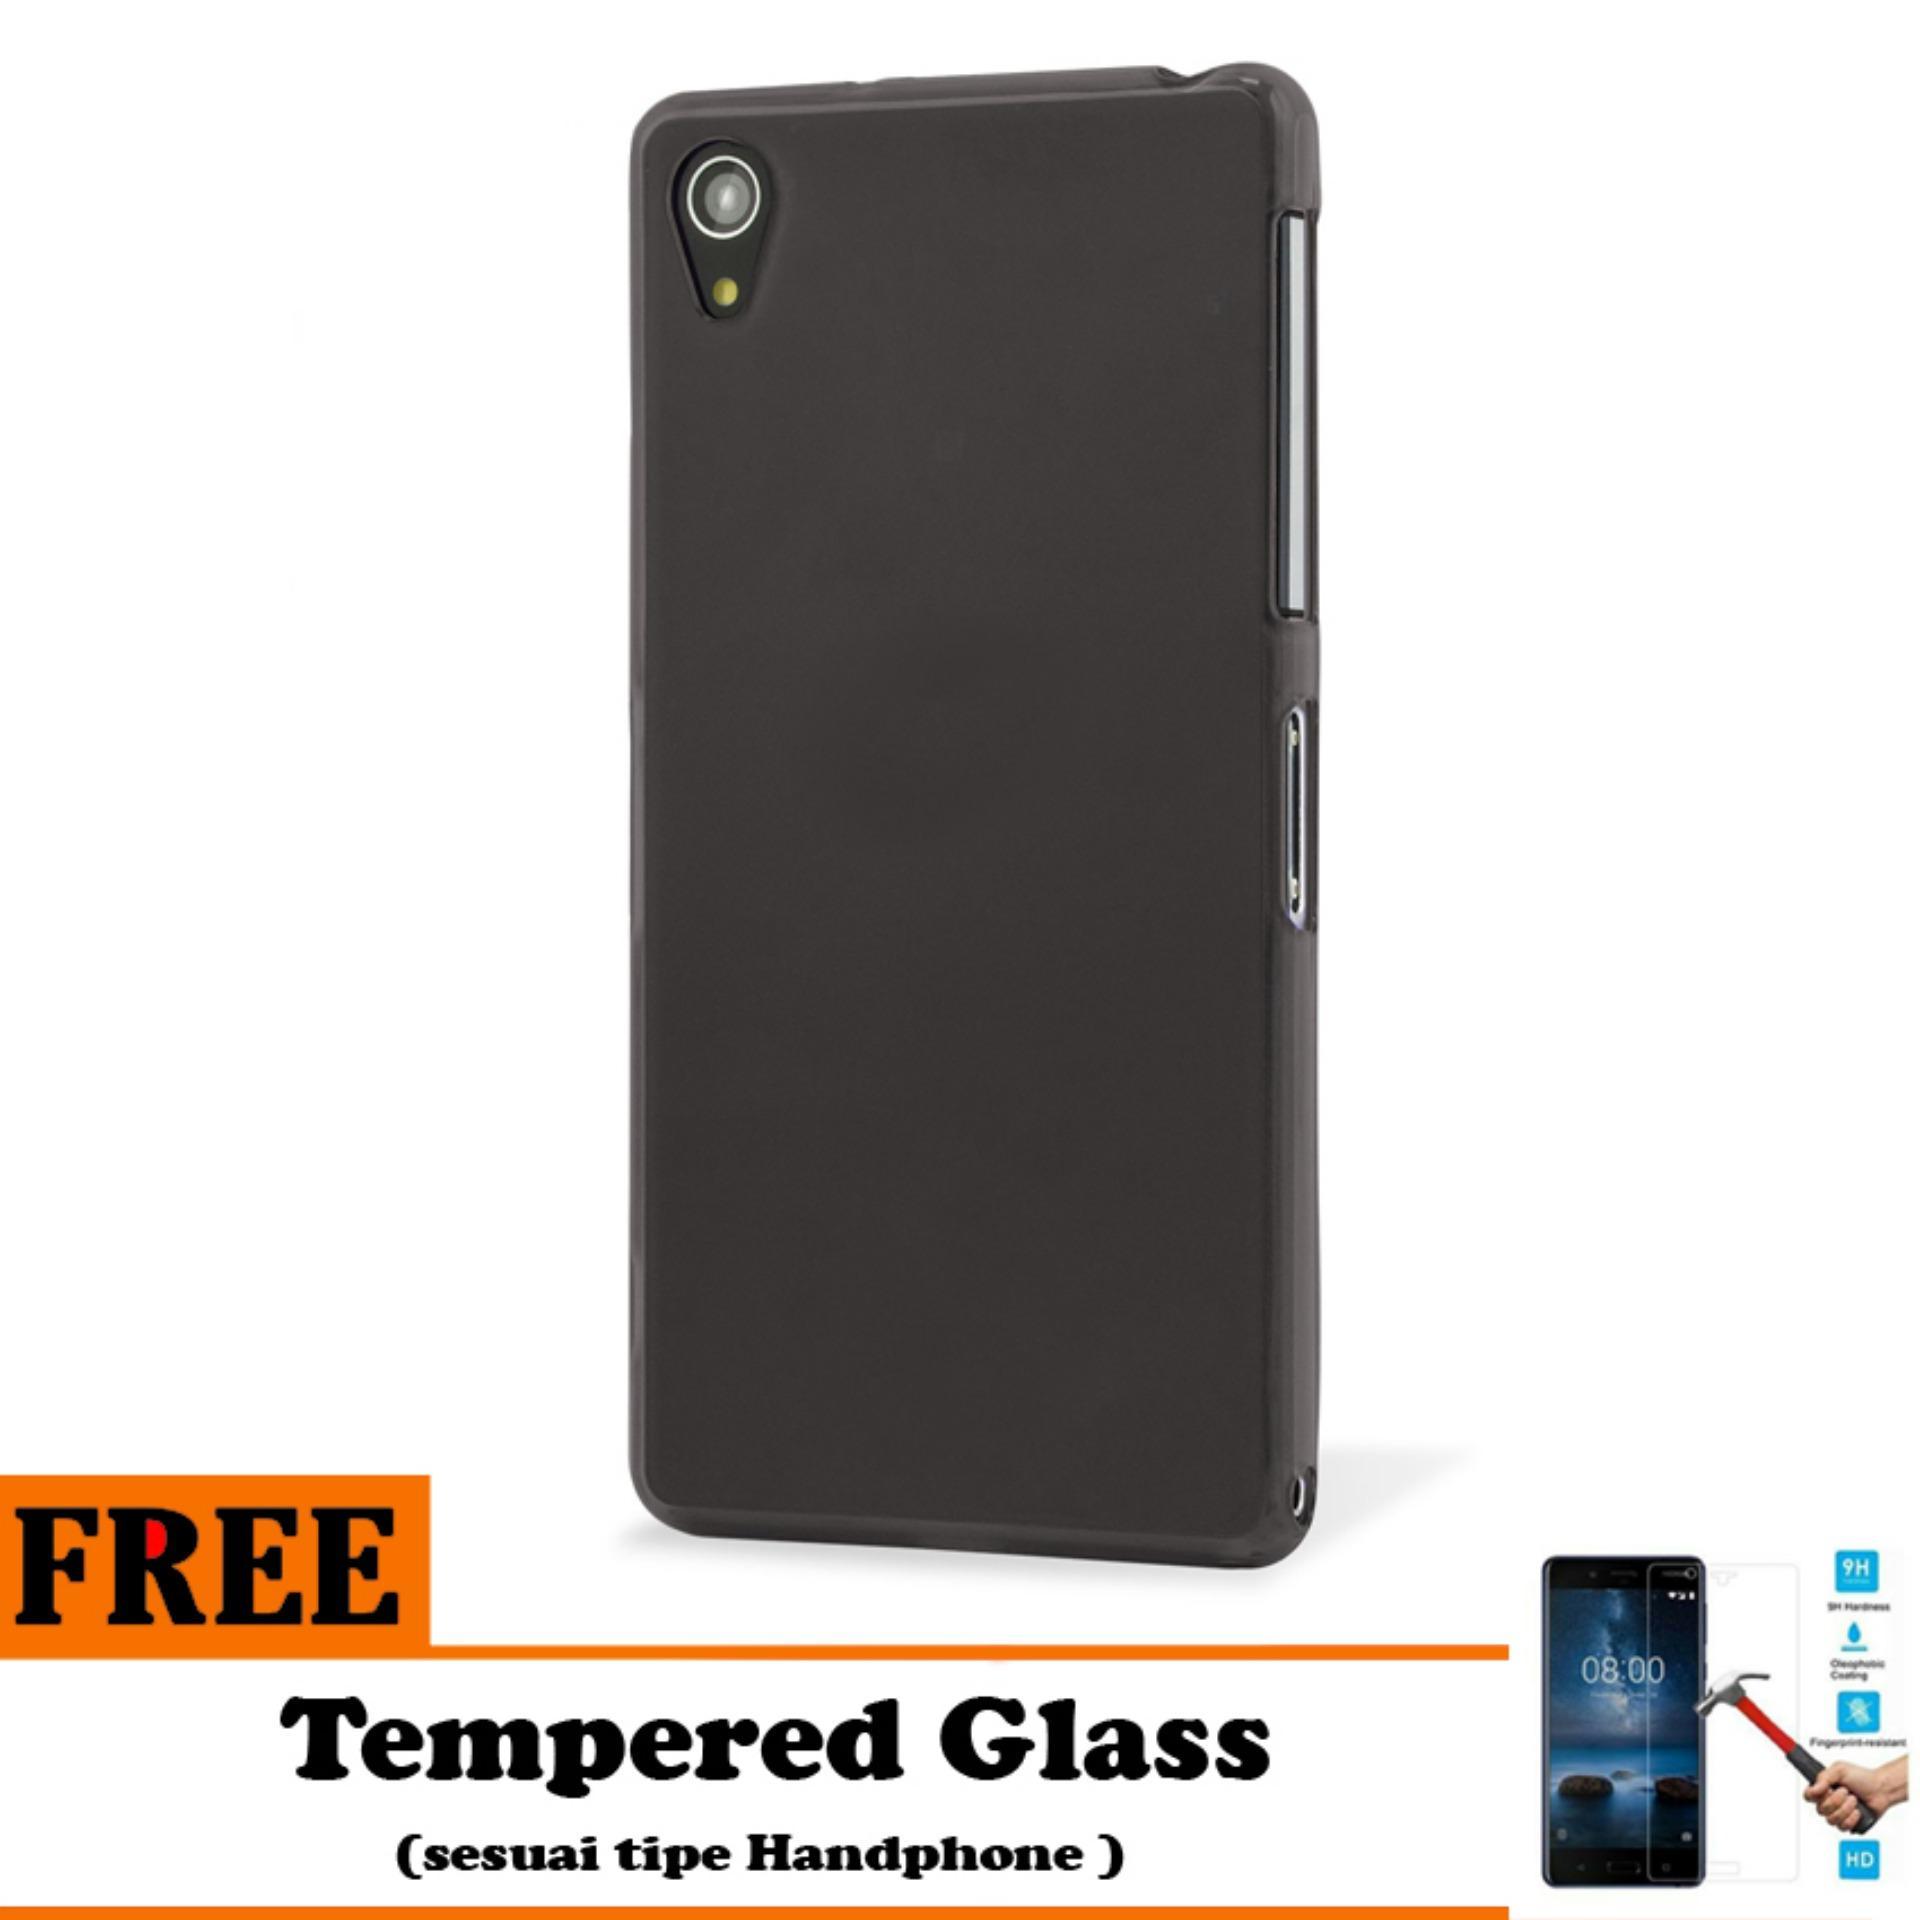 Barokah Premium  Slim Black Matte Shockproof Case for Sony Xperia Z2    - Free Tempered Glass